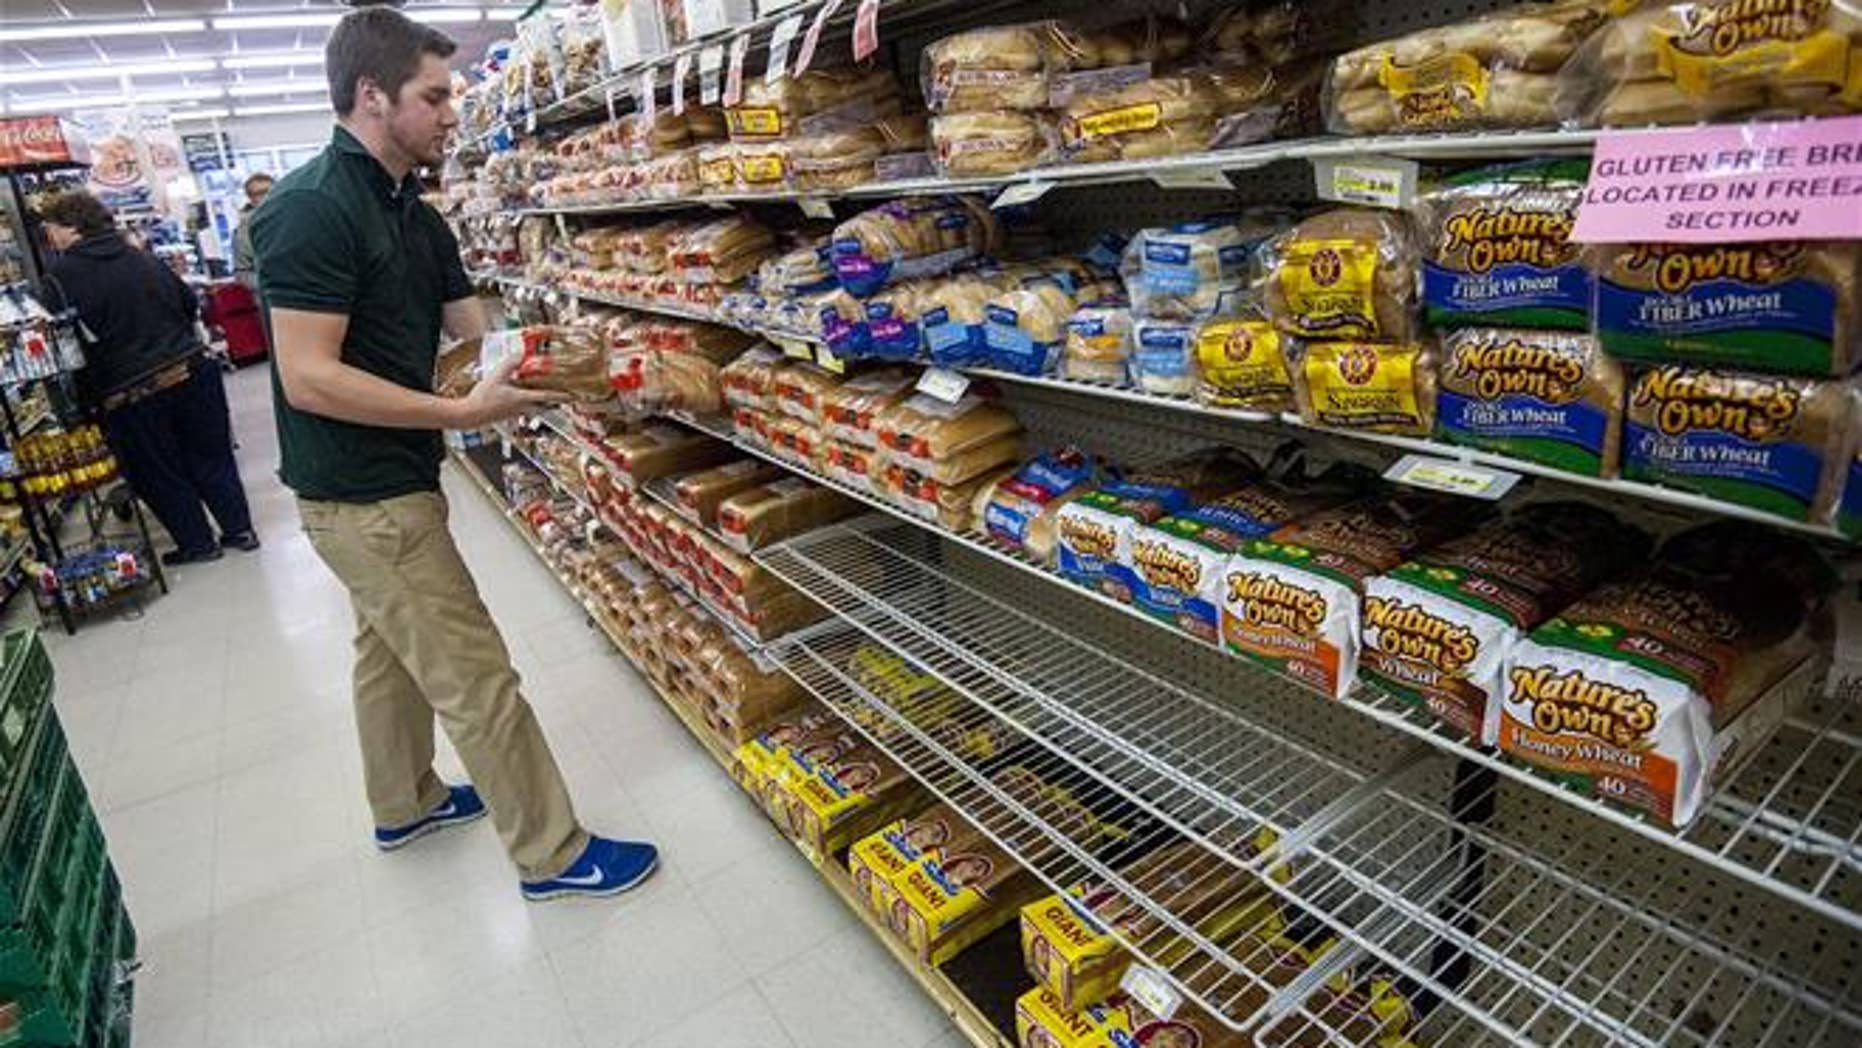 Bridgewater College junior communication major Jonah Barnhart, of Culpepper, Va., a floor stocker at Bridgewater Foods, stocks the bread aisle on Wednesday, Jan. 20, 2015, in Bridgewater, Va.